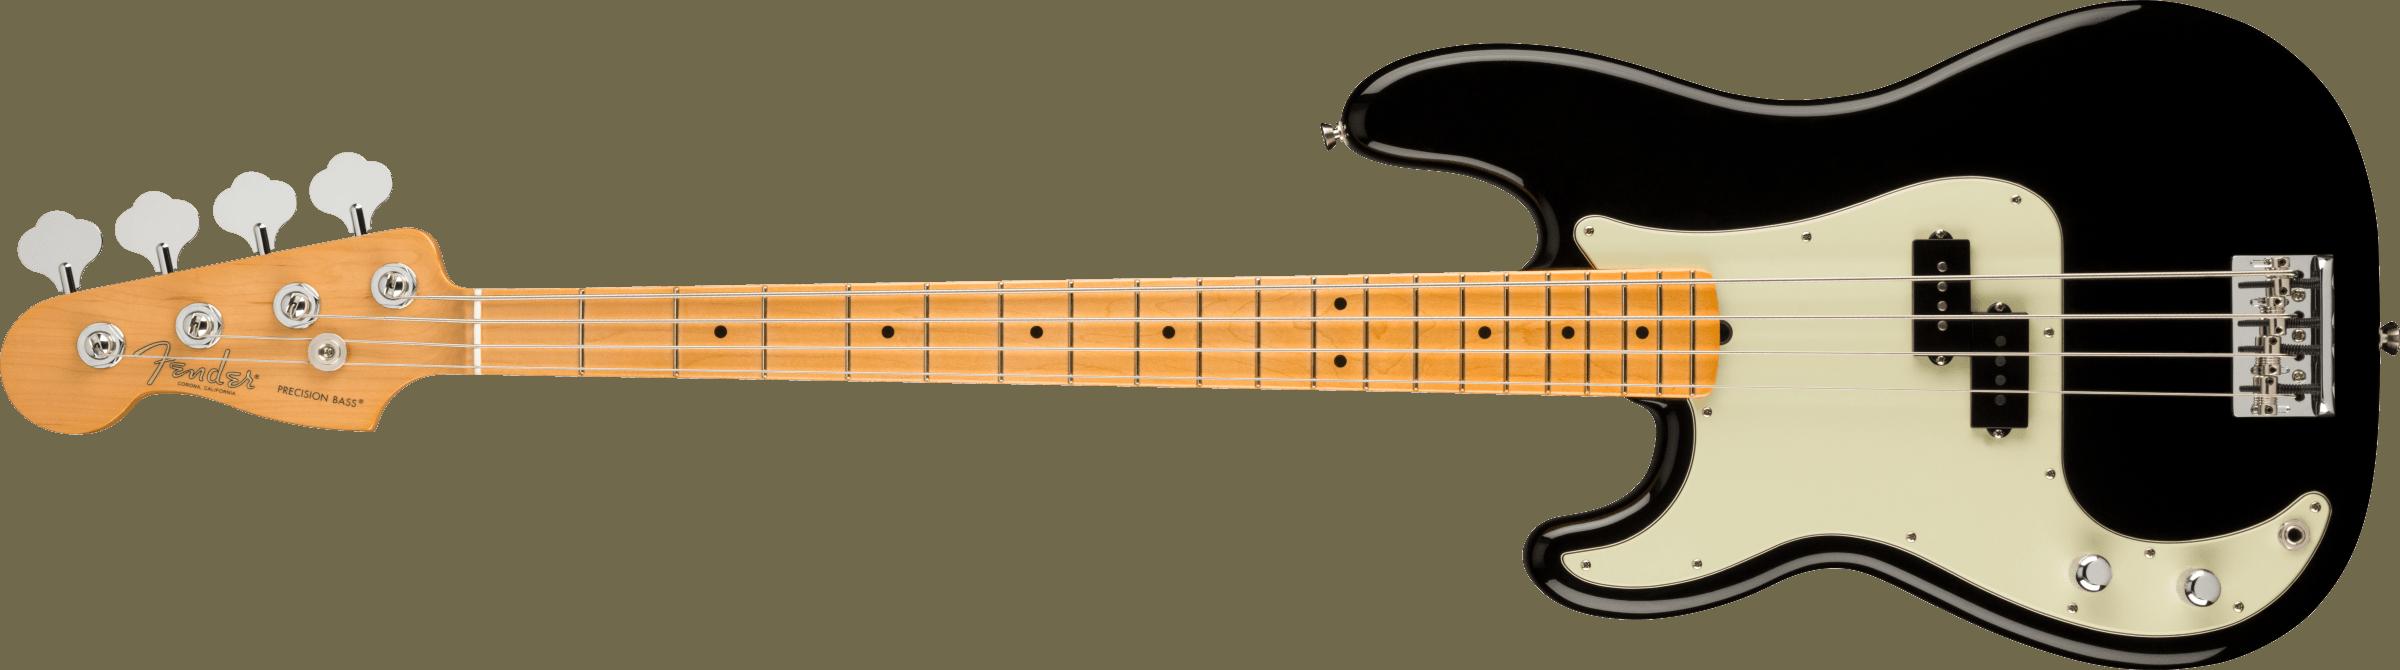 FENDER-American-Professional-II-Precision-Bass-Left-Hand-Maple-Fingerboard-Black-sku-571005261